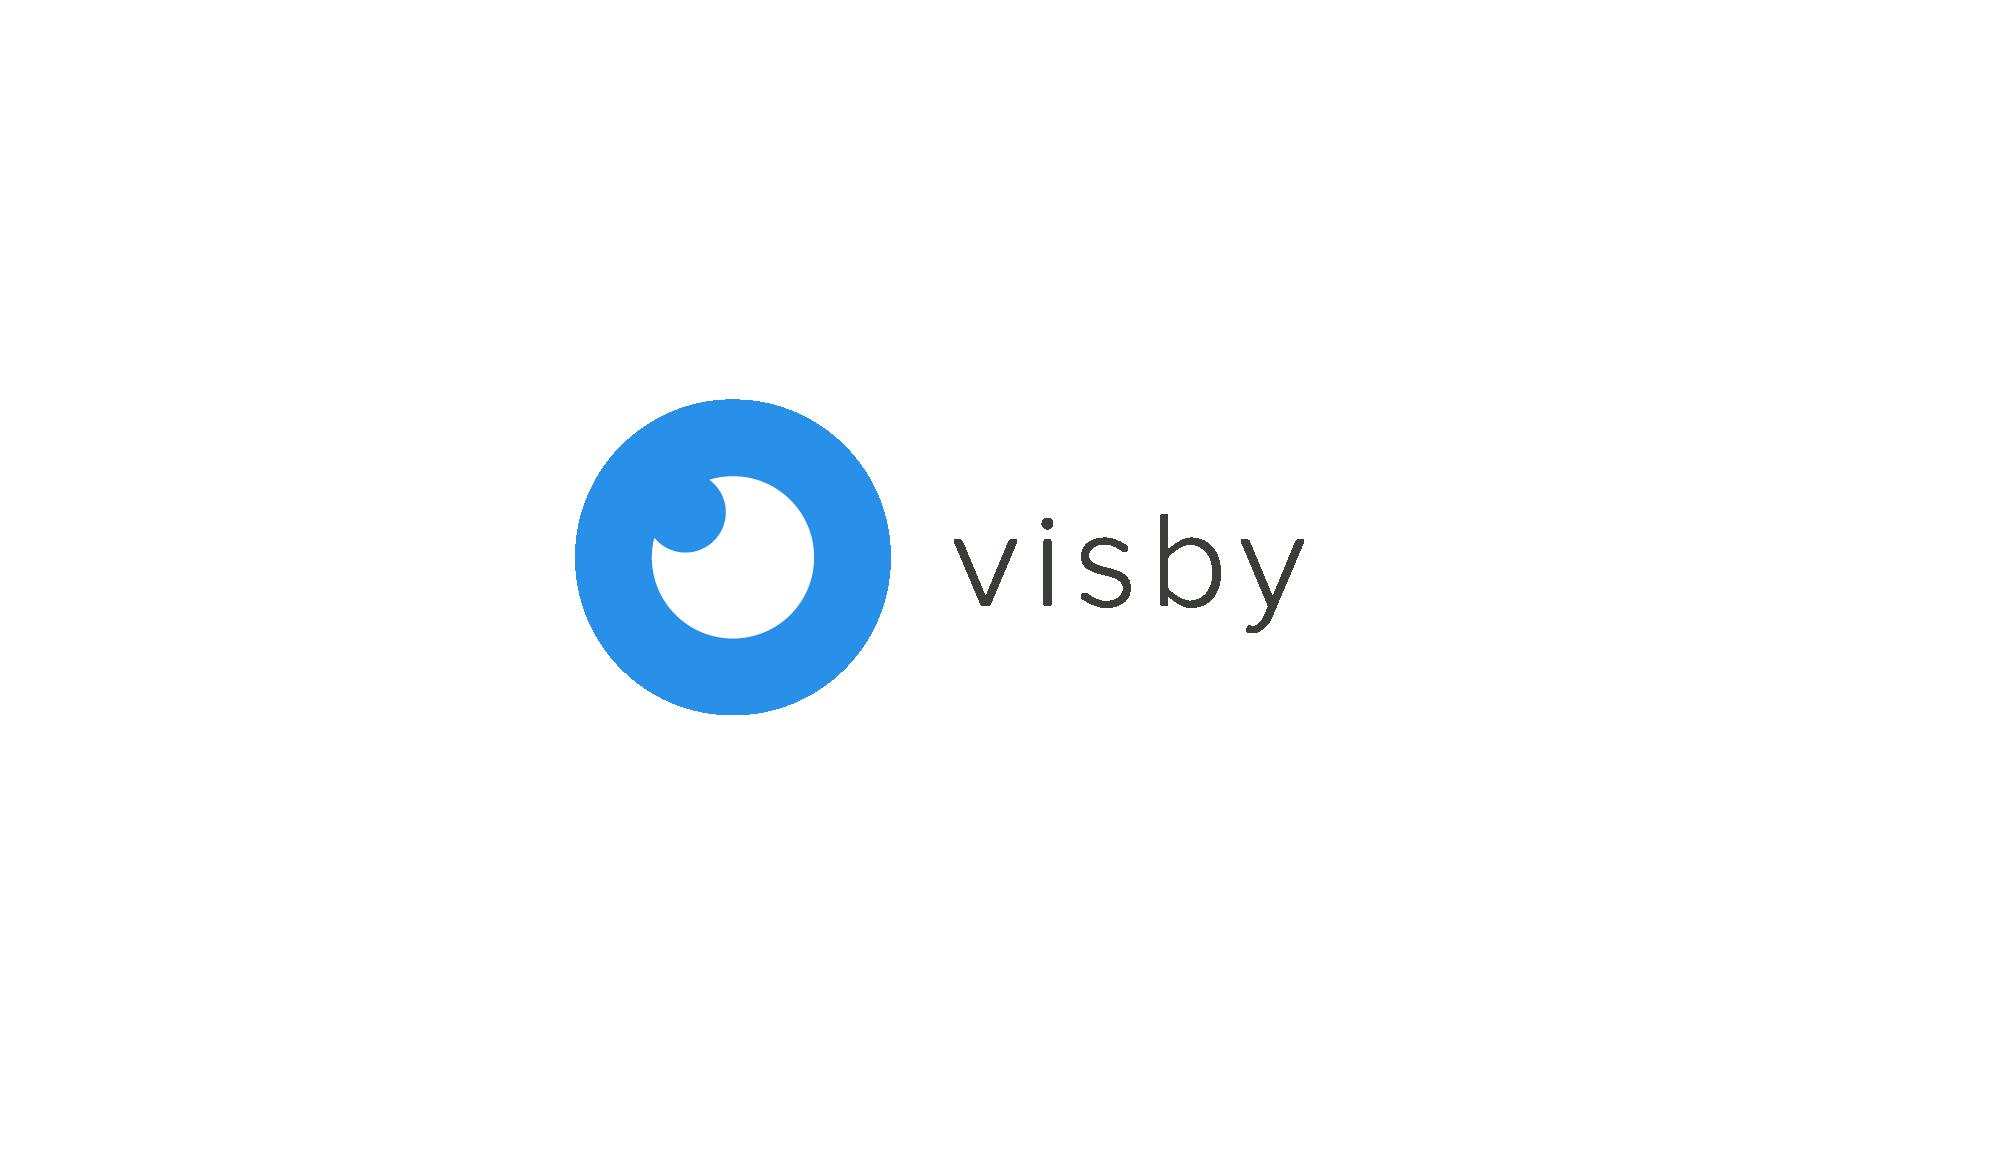 sb-logo-visby-01